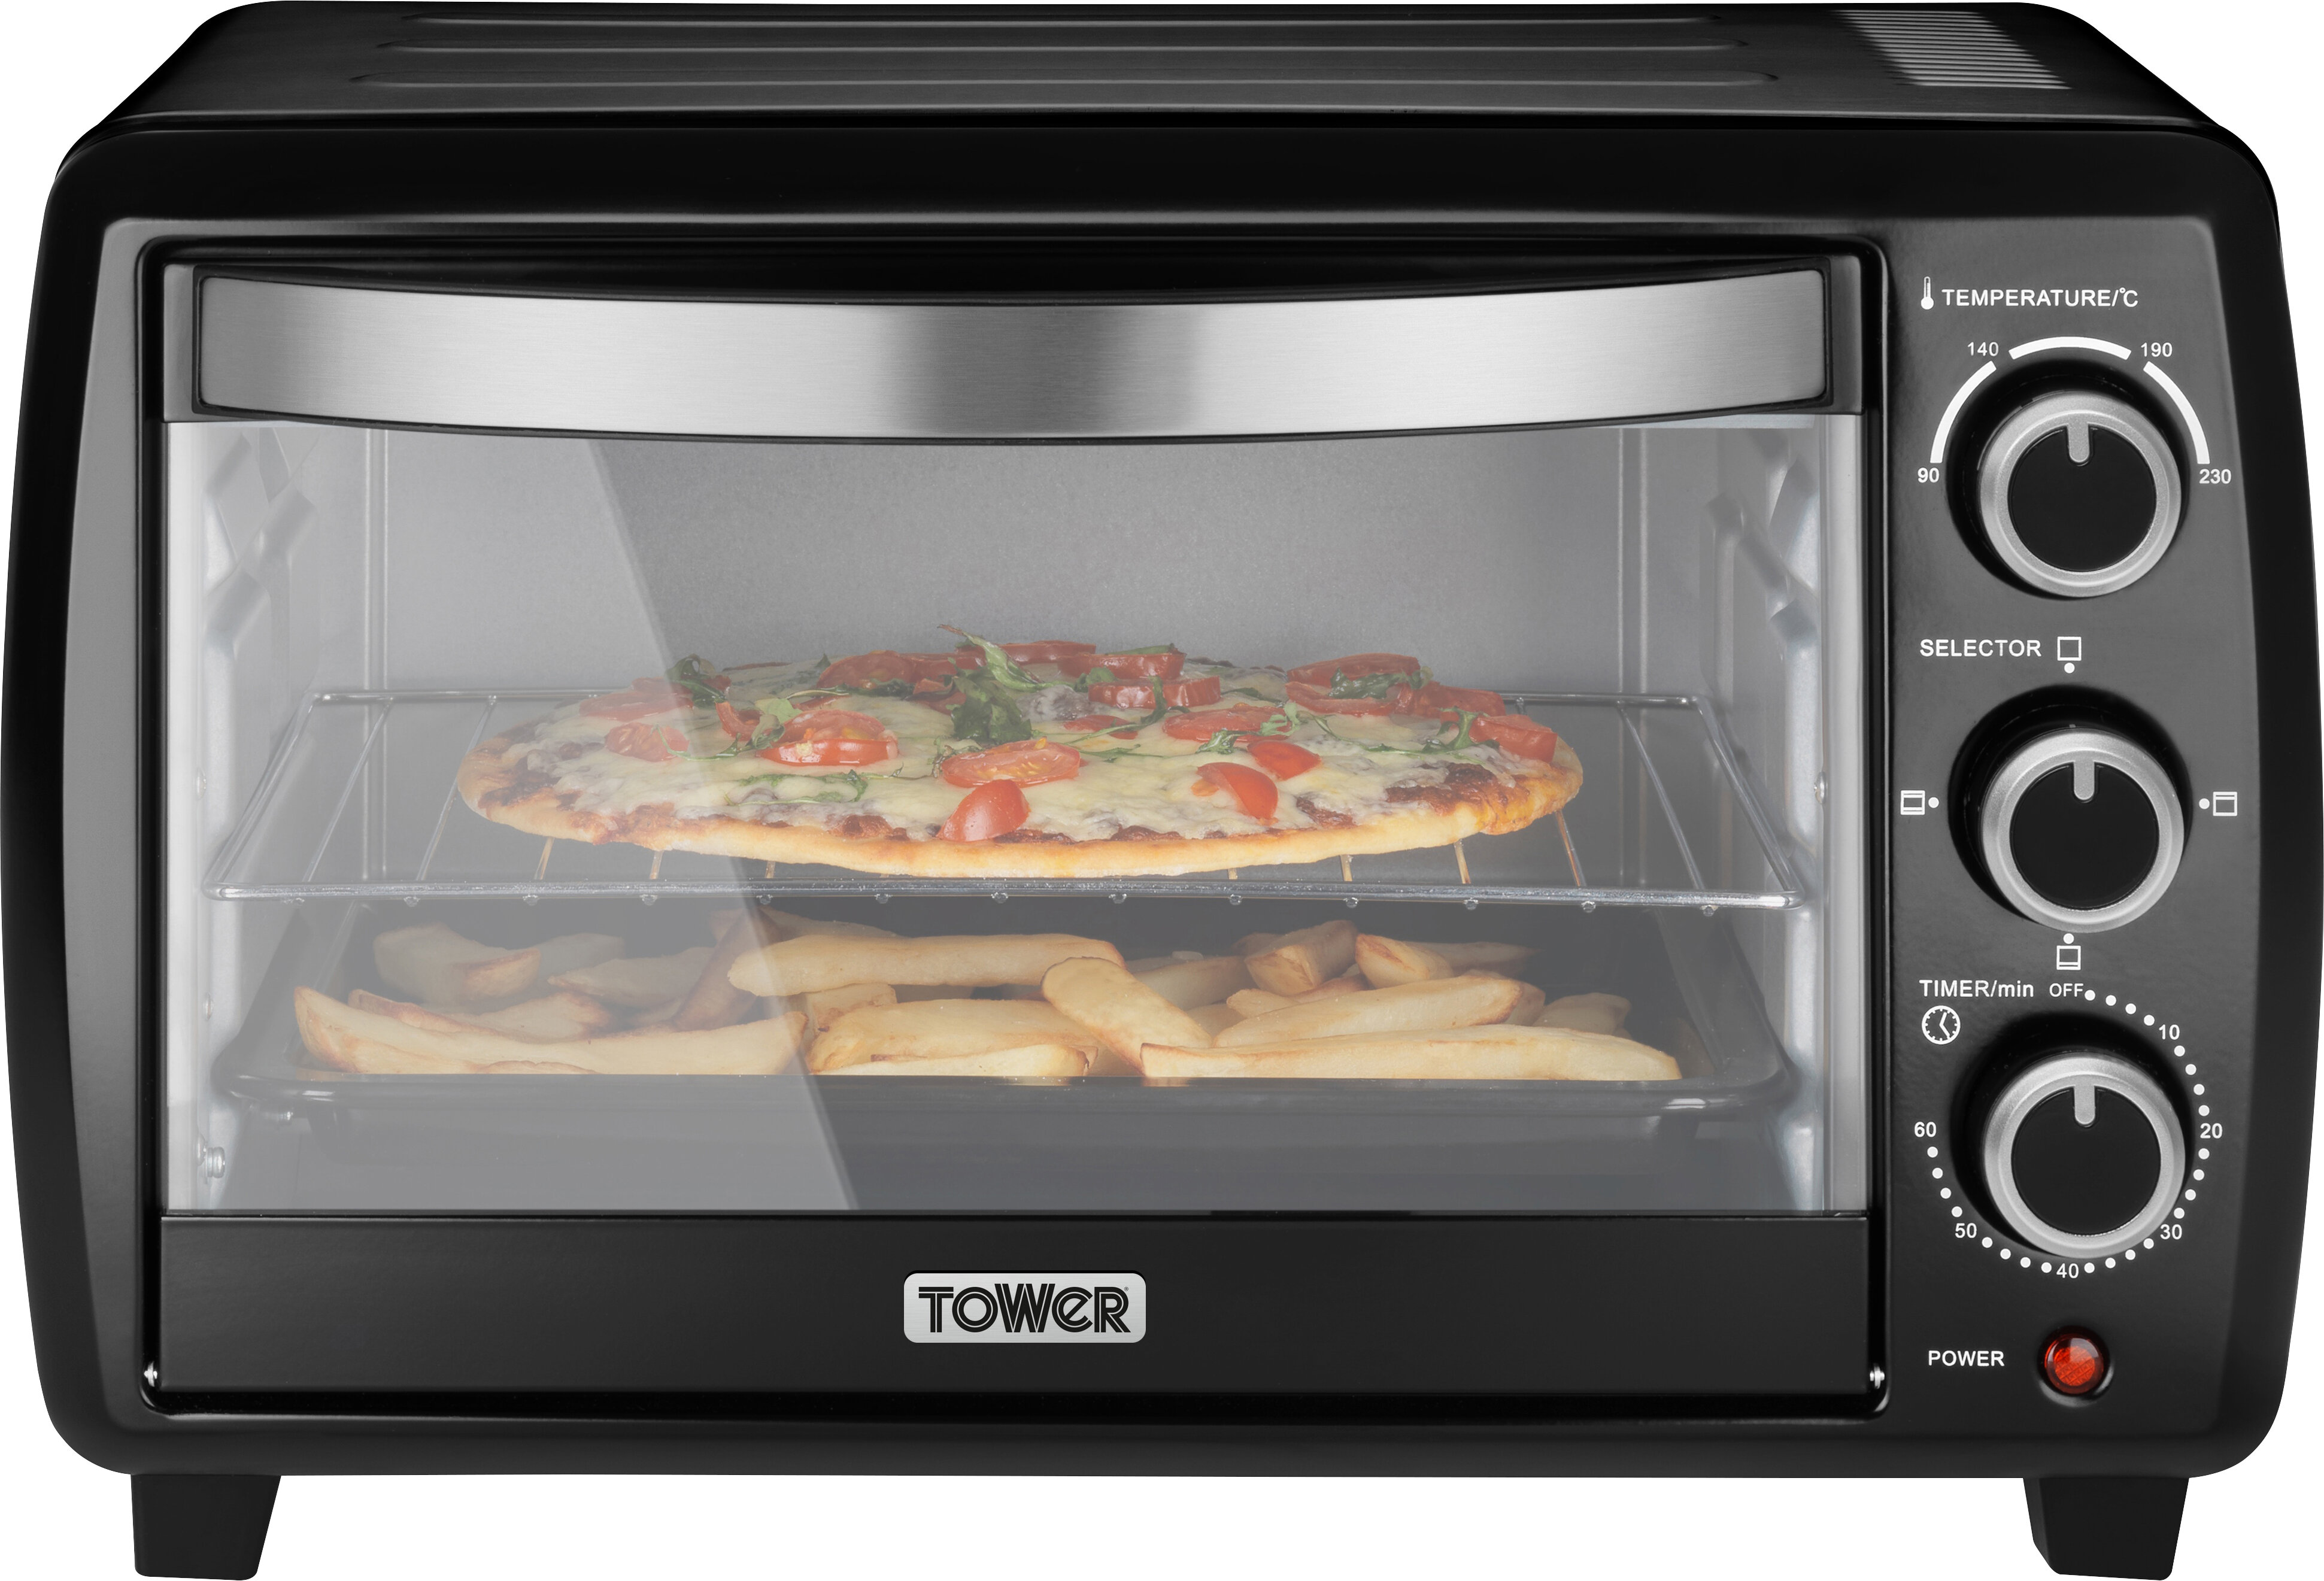 tower 23l mini oven reviews wayfair co uk